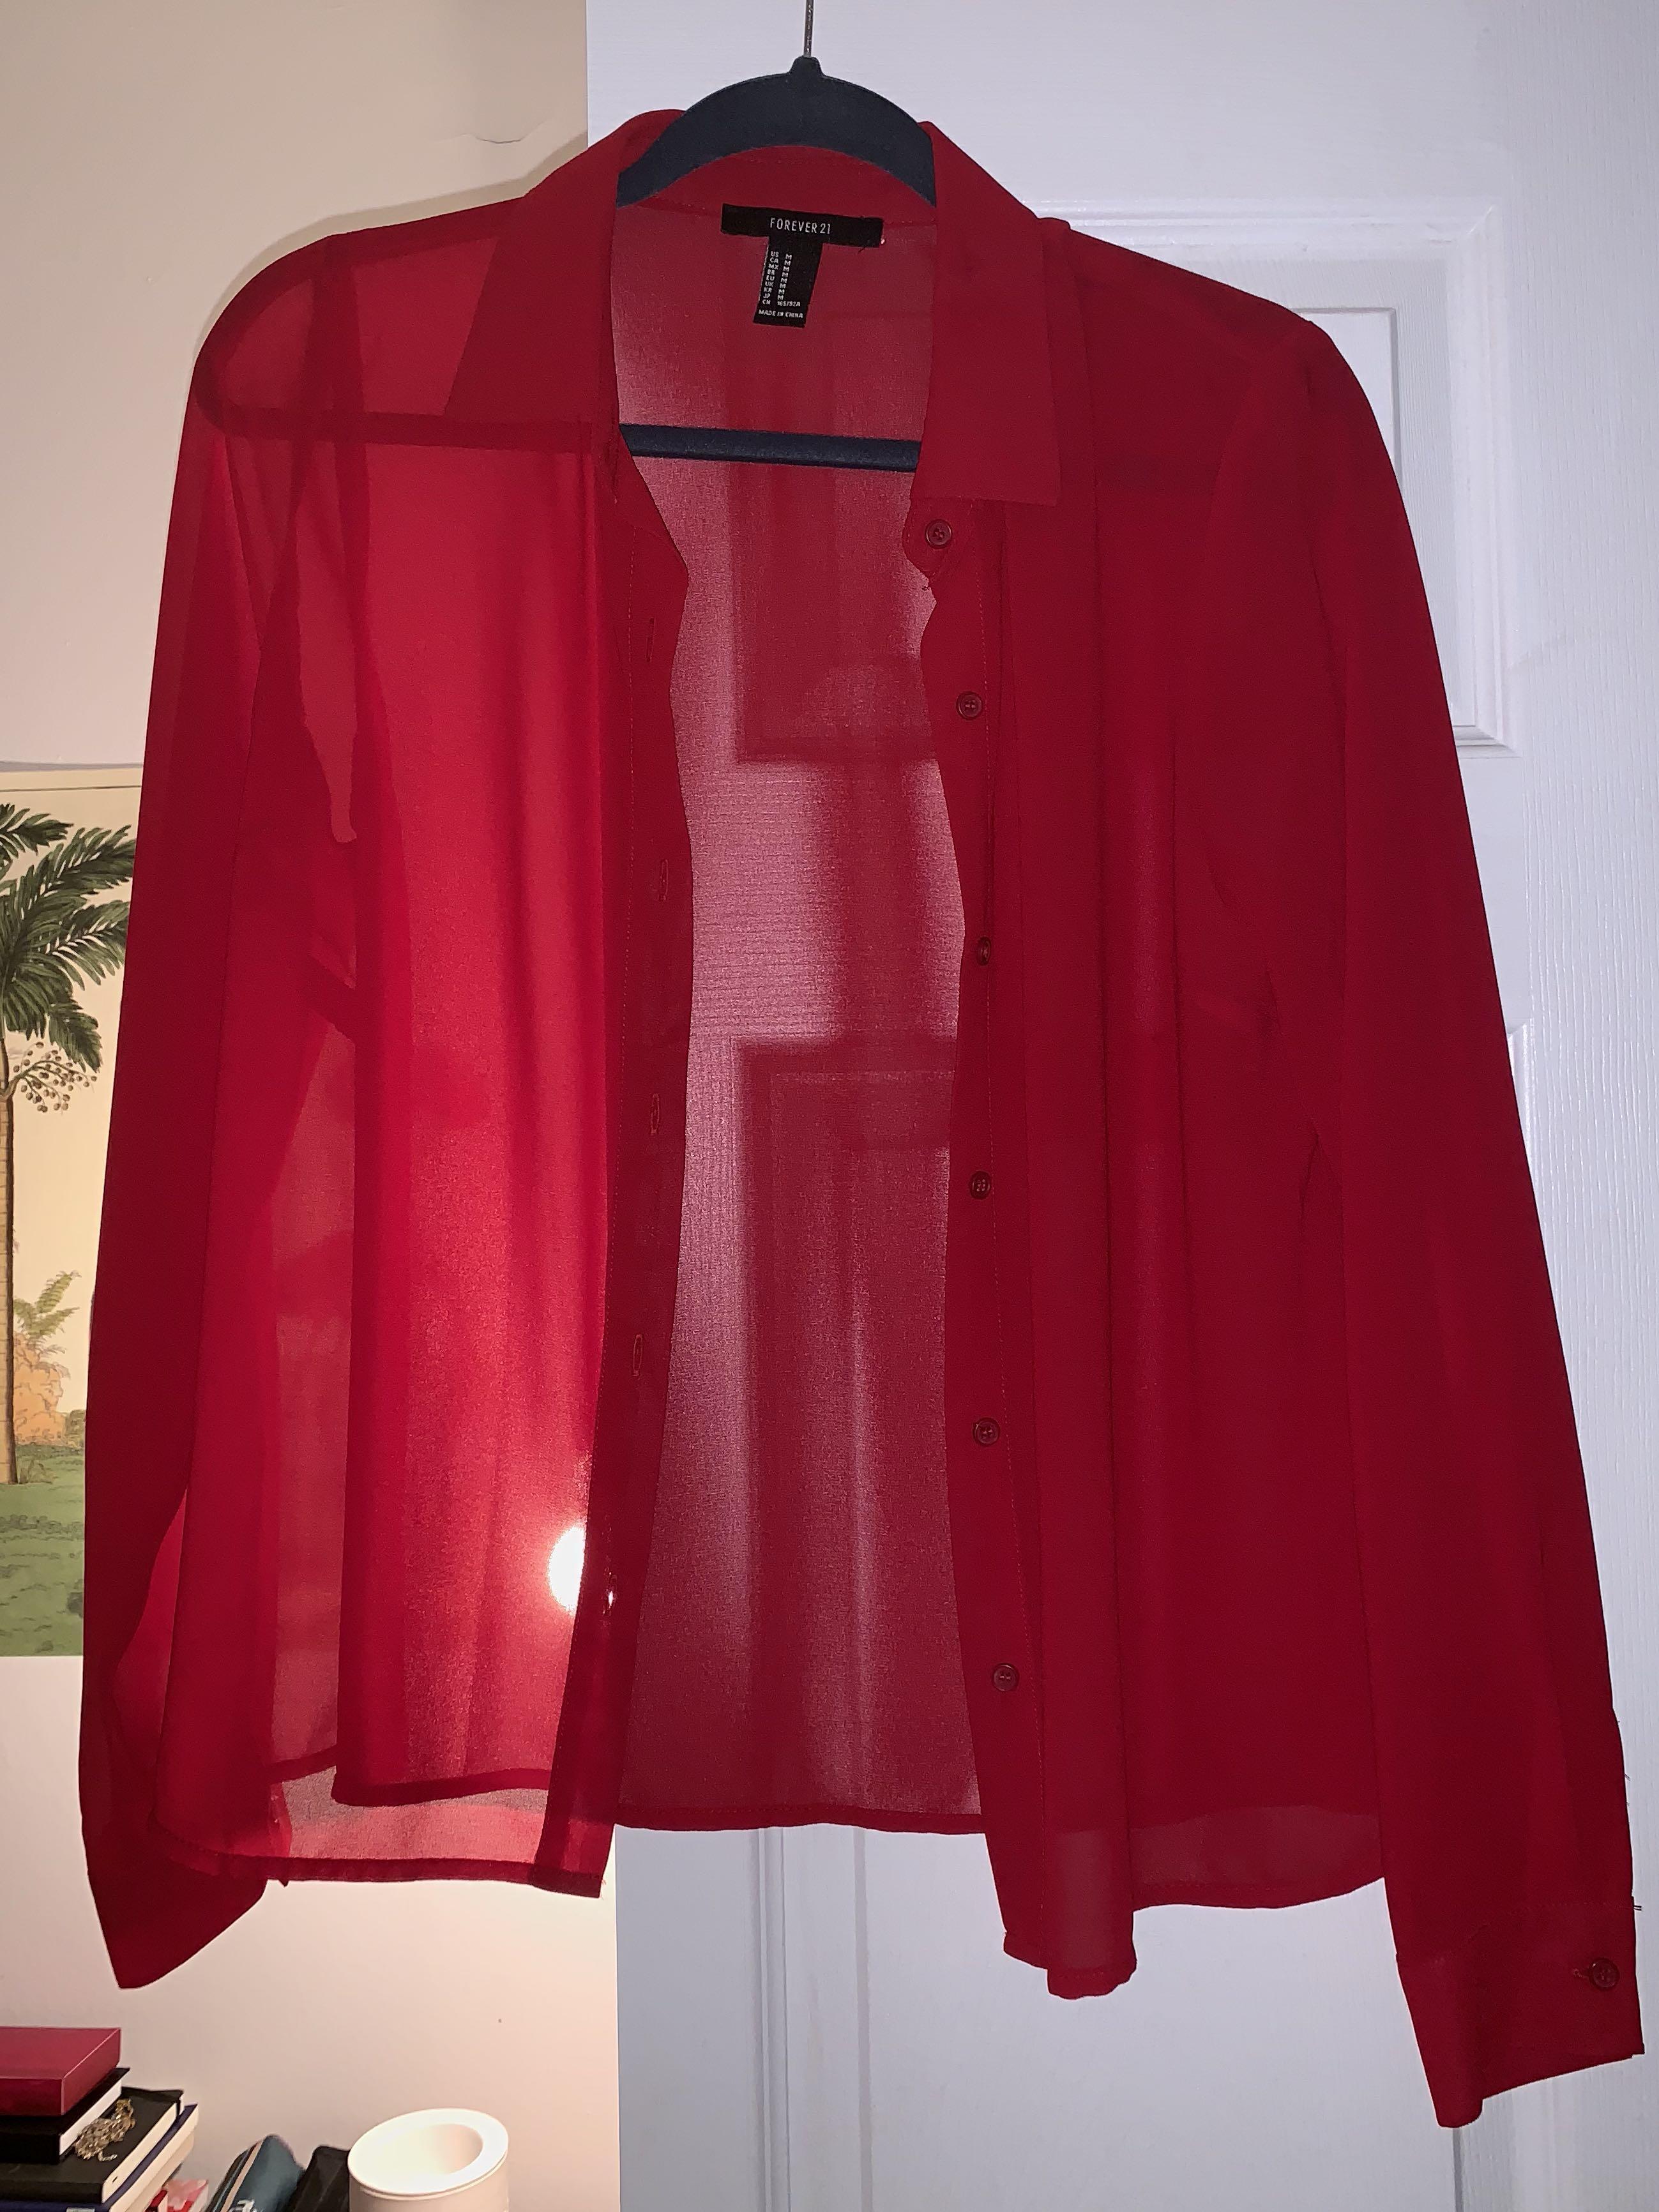 Red chiffon see through dress shirt